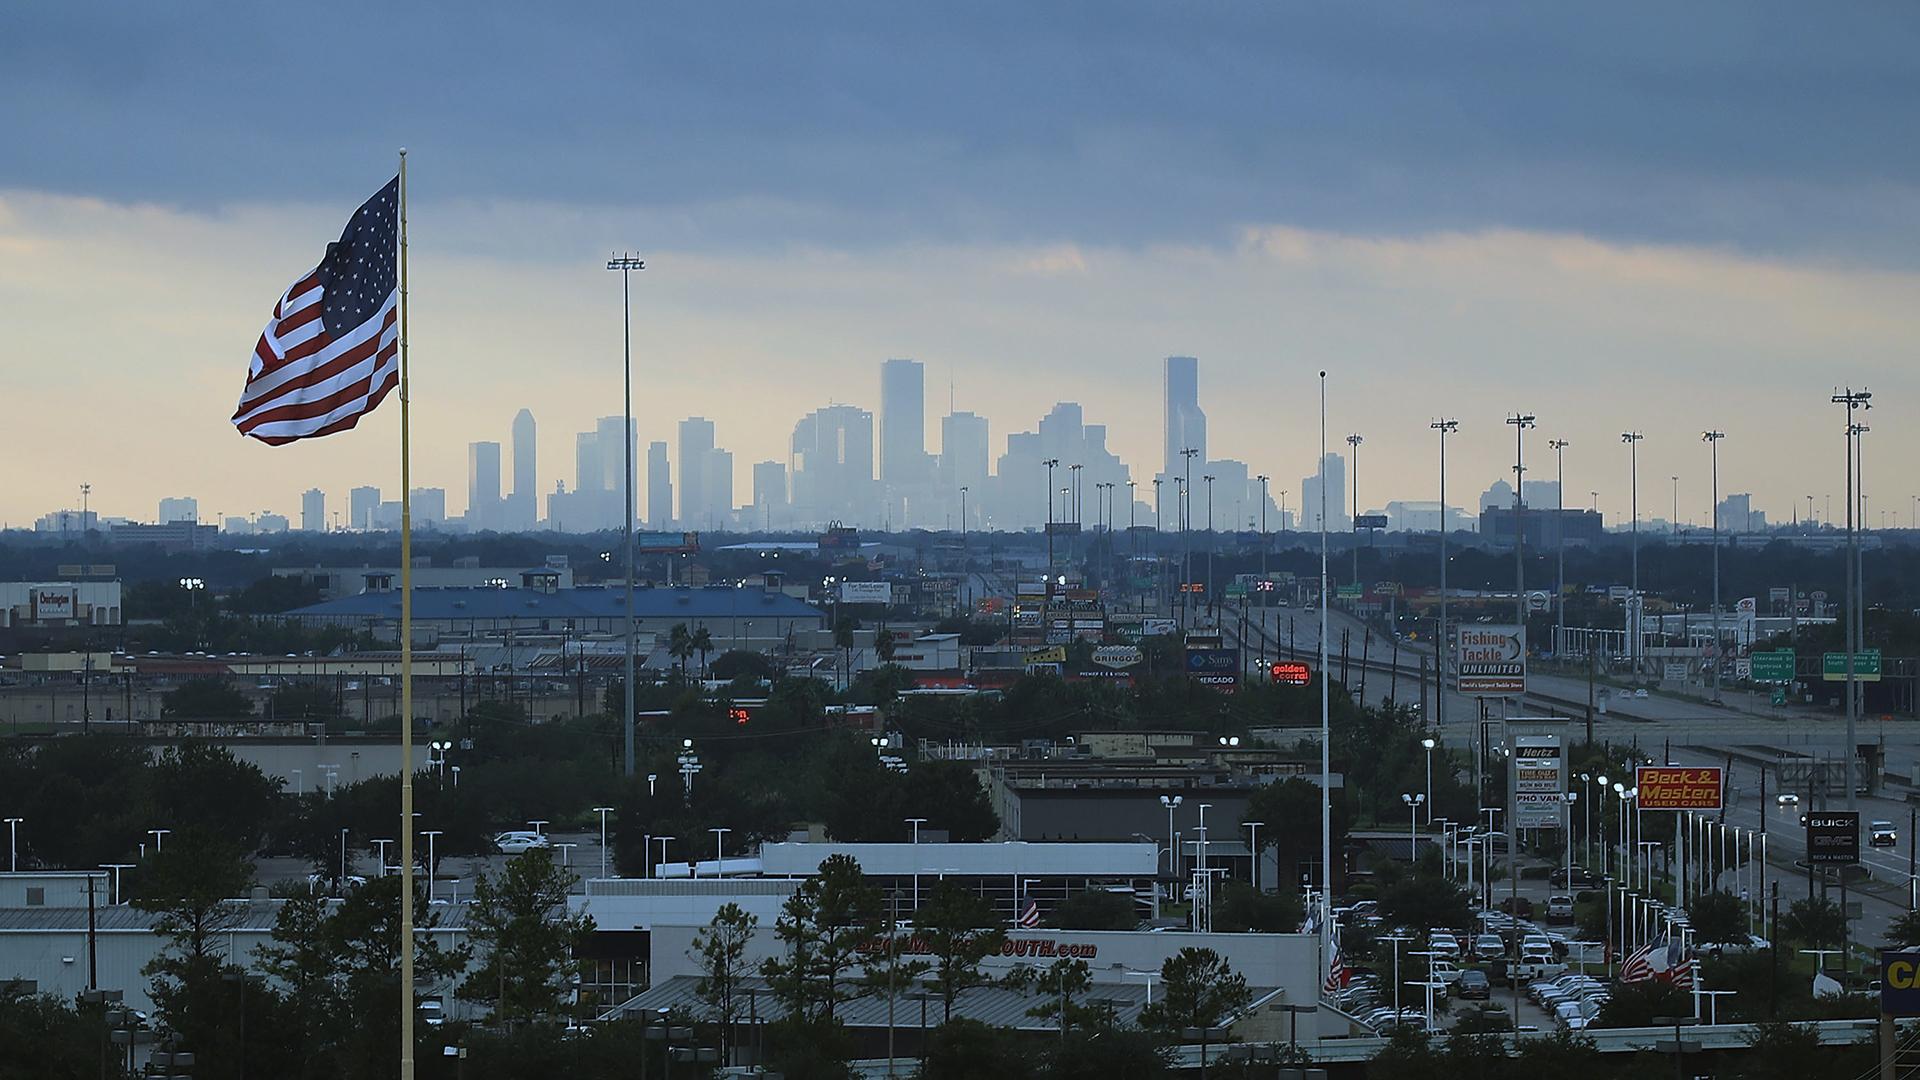 Houston skyline on Aug 29 2017 after Hurricane Harvey-159532.jpg49137766